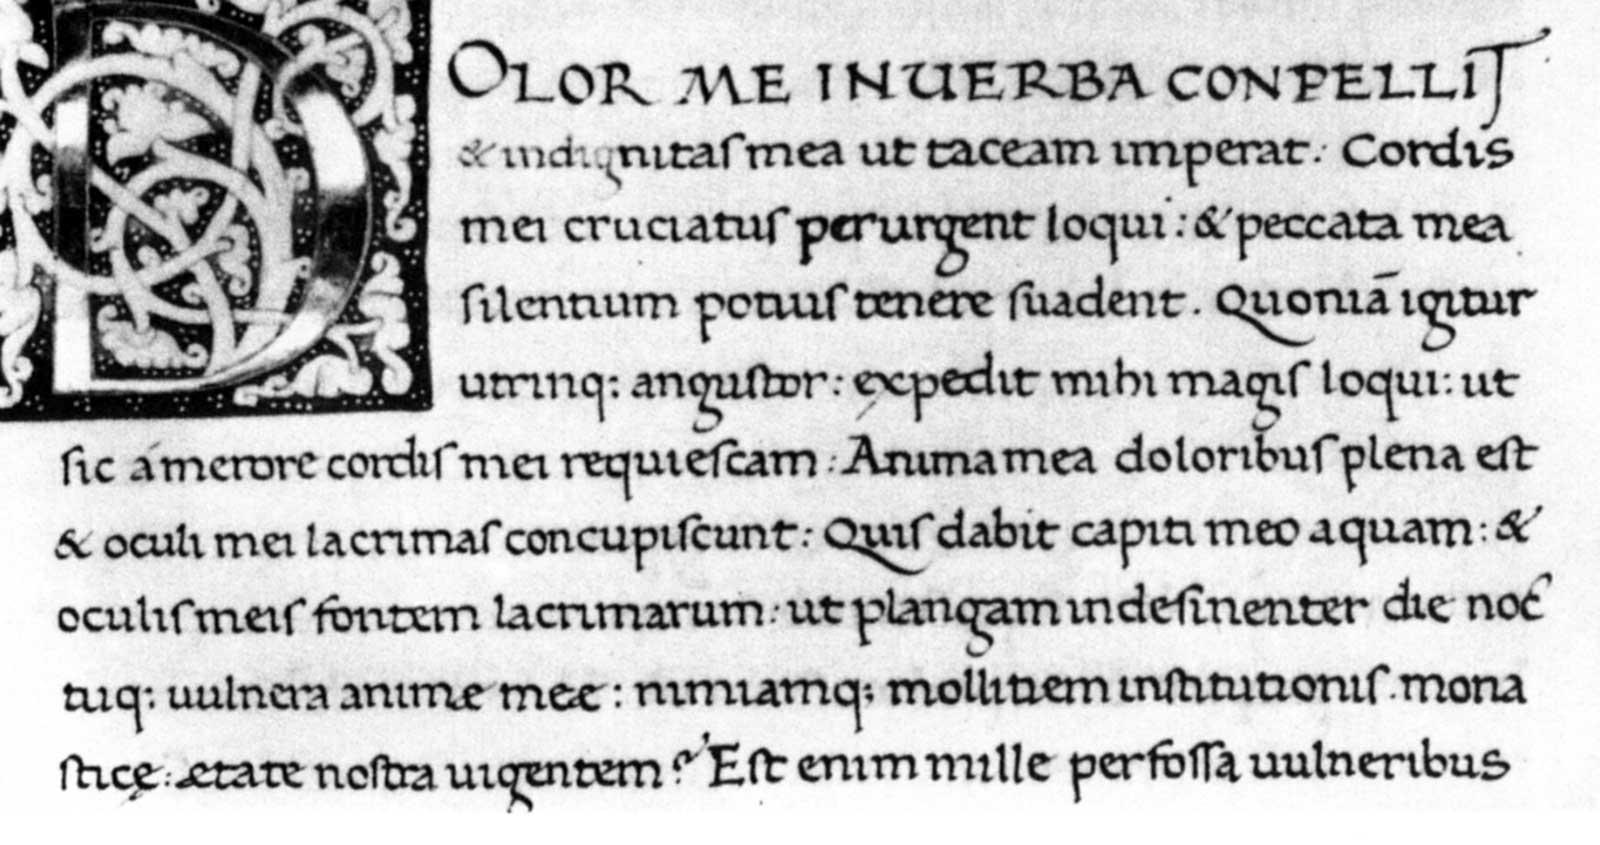 Antonio-di-Mario-1448